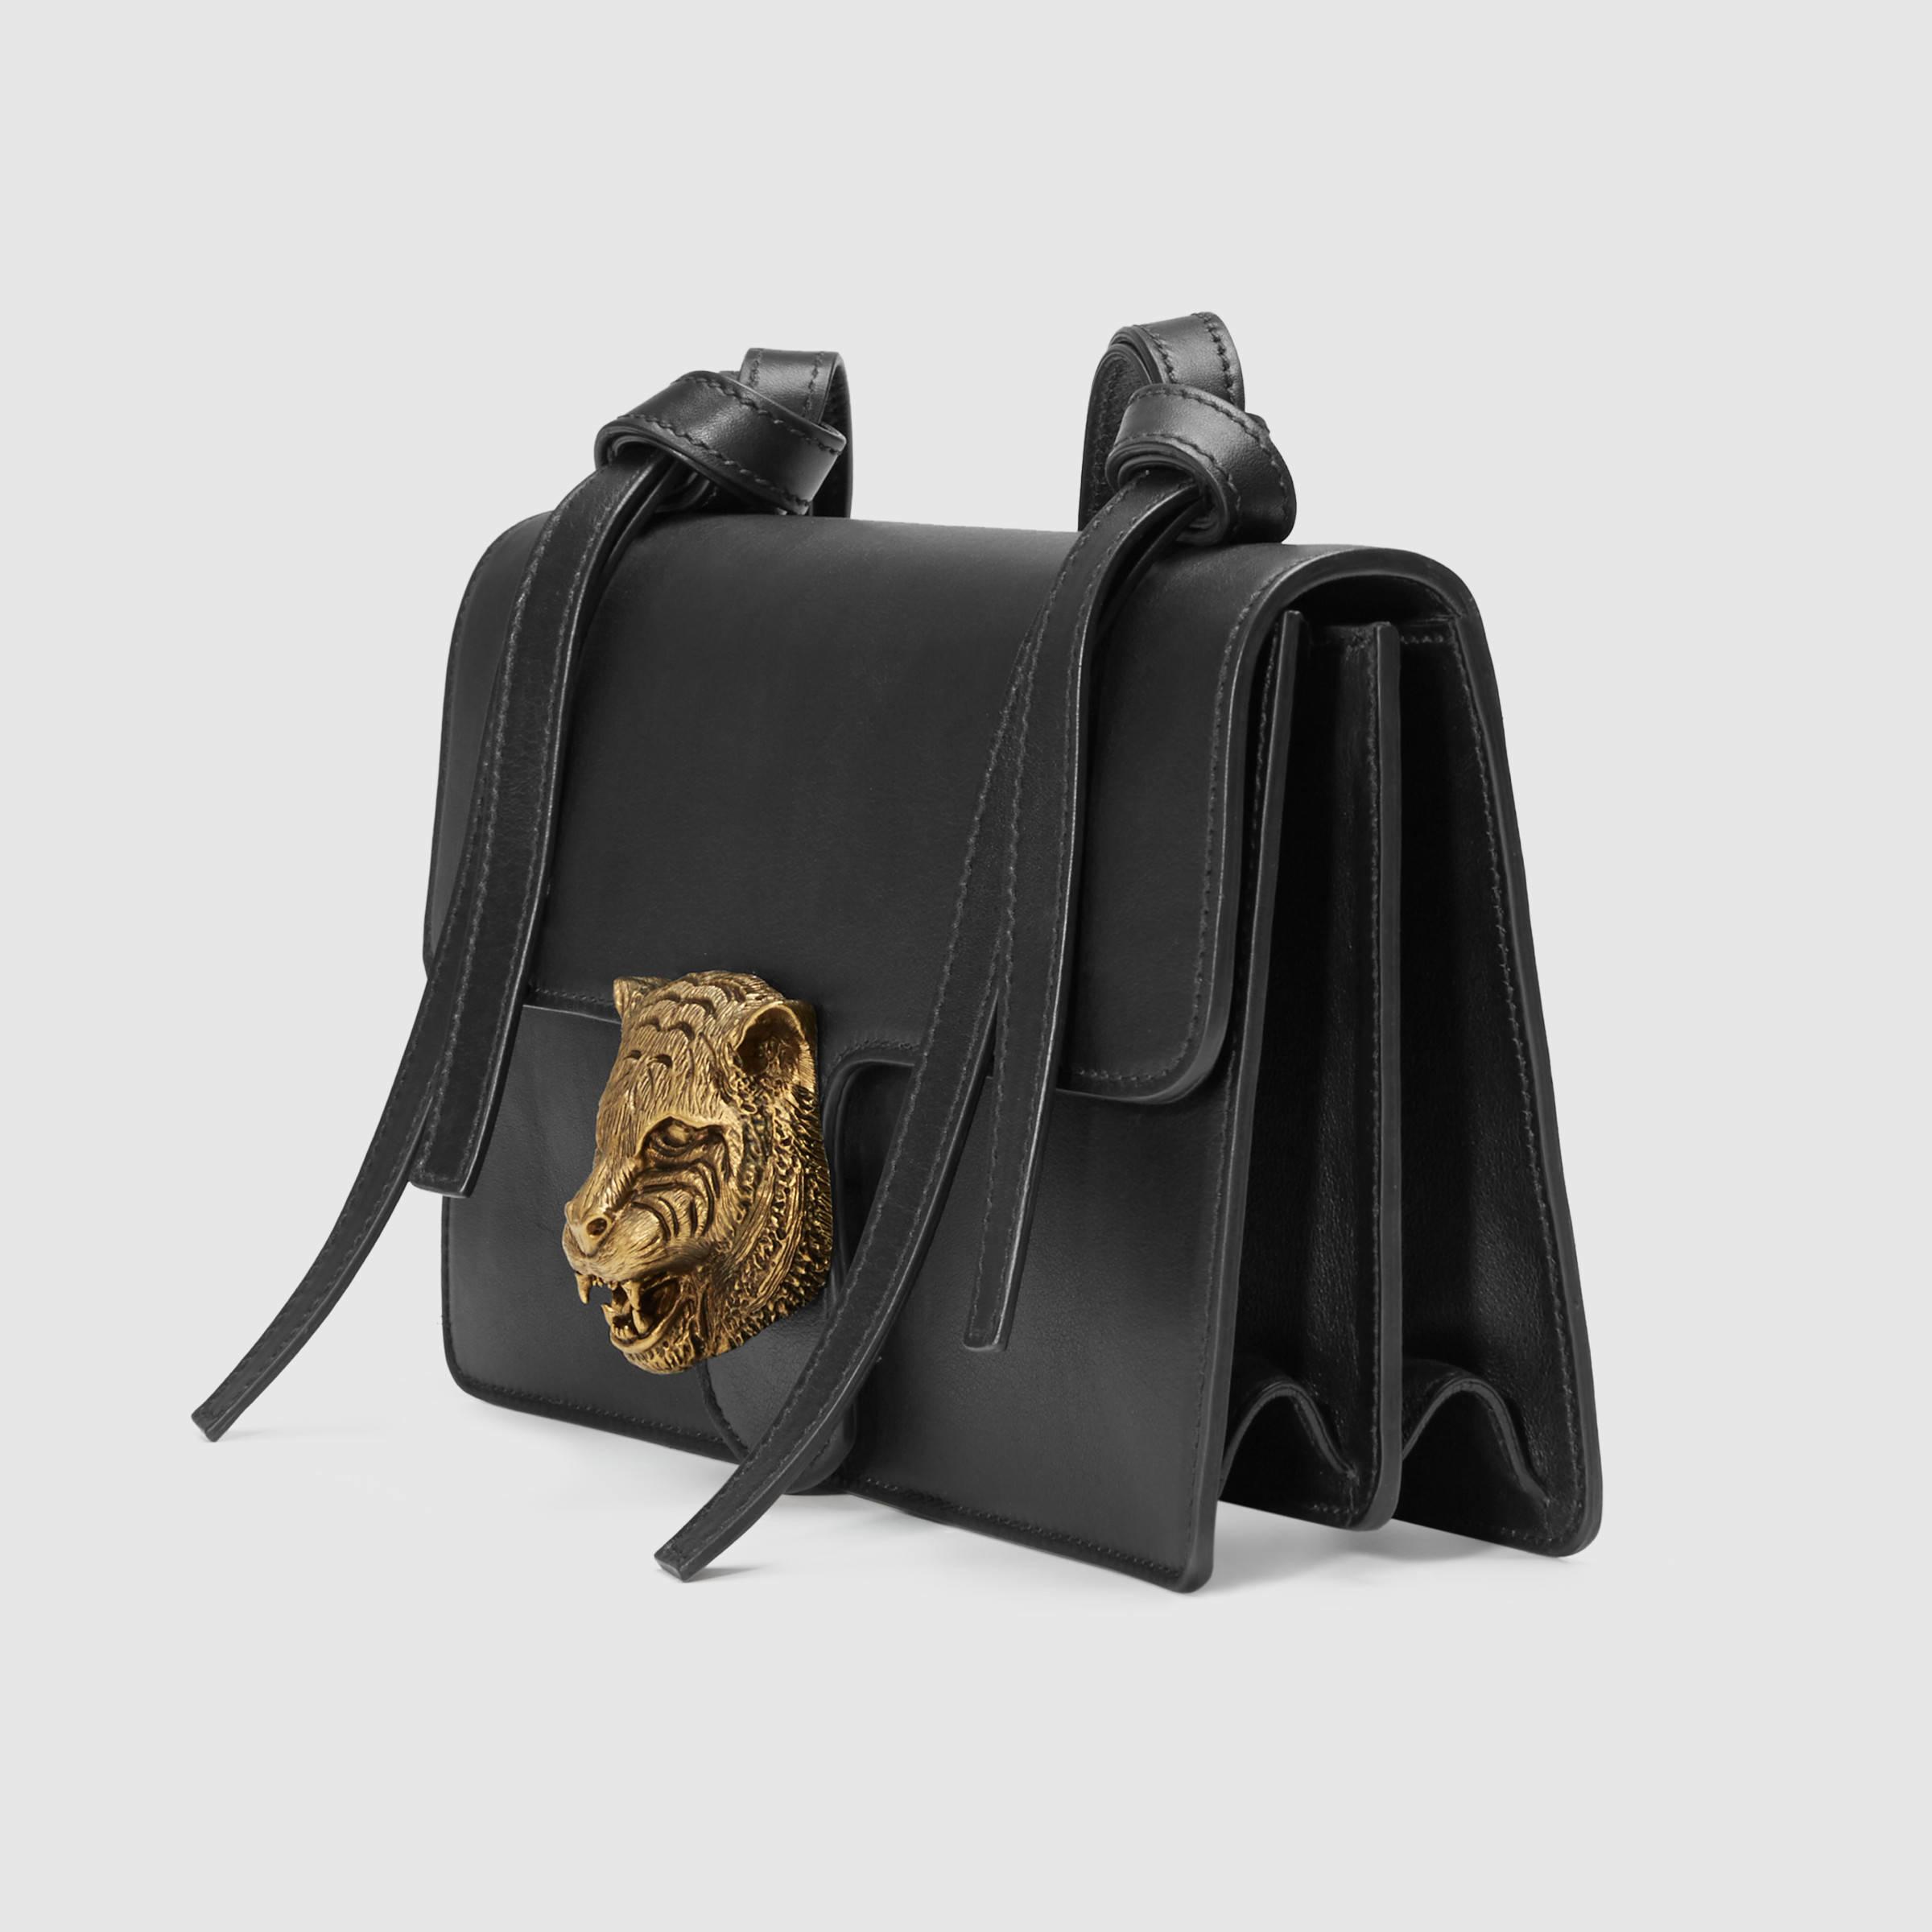 703d376d2c9 Gucci Animalier Leather Shoulder Bag in Black - Lyst